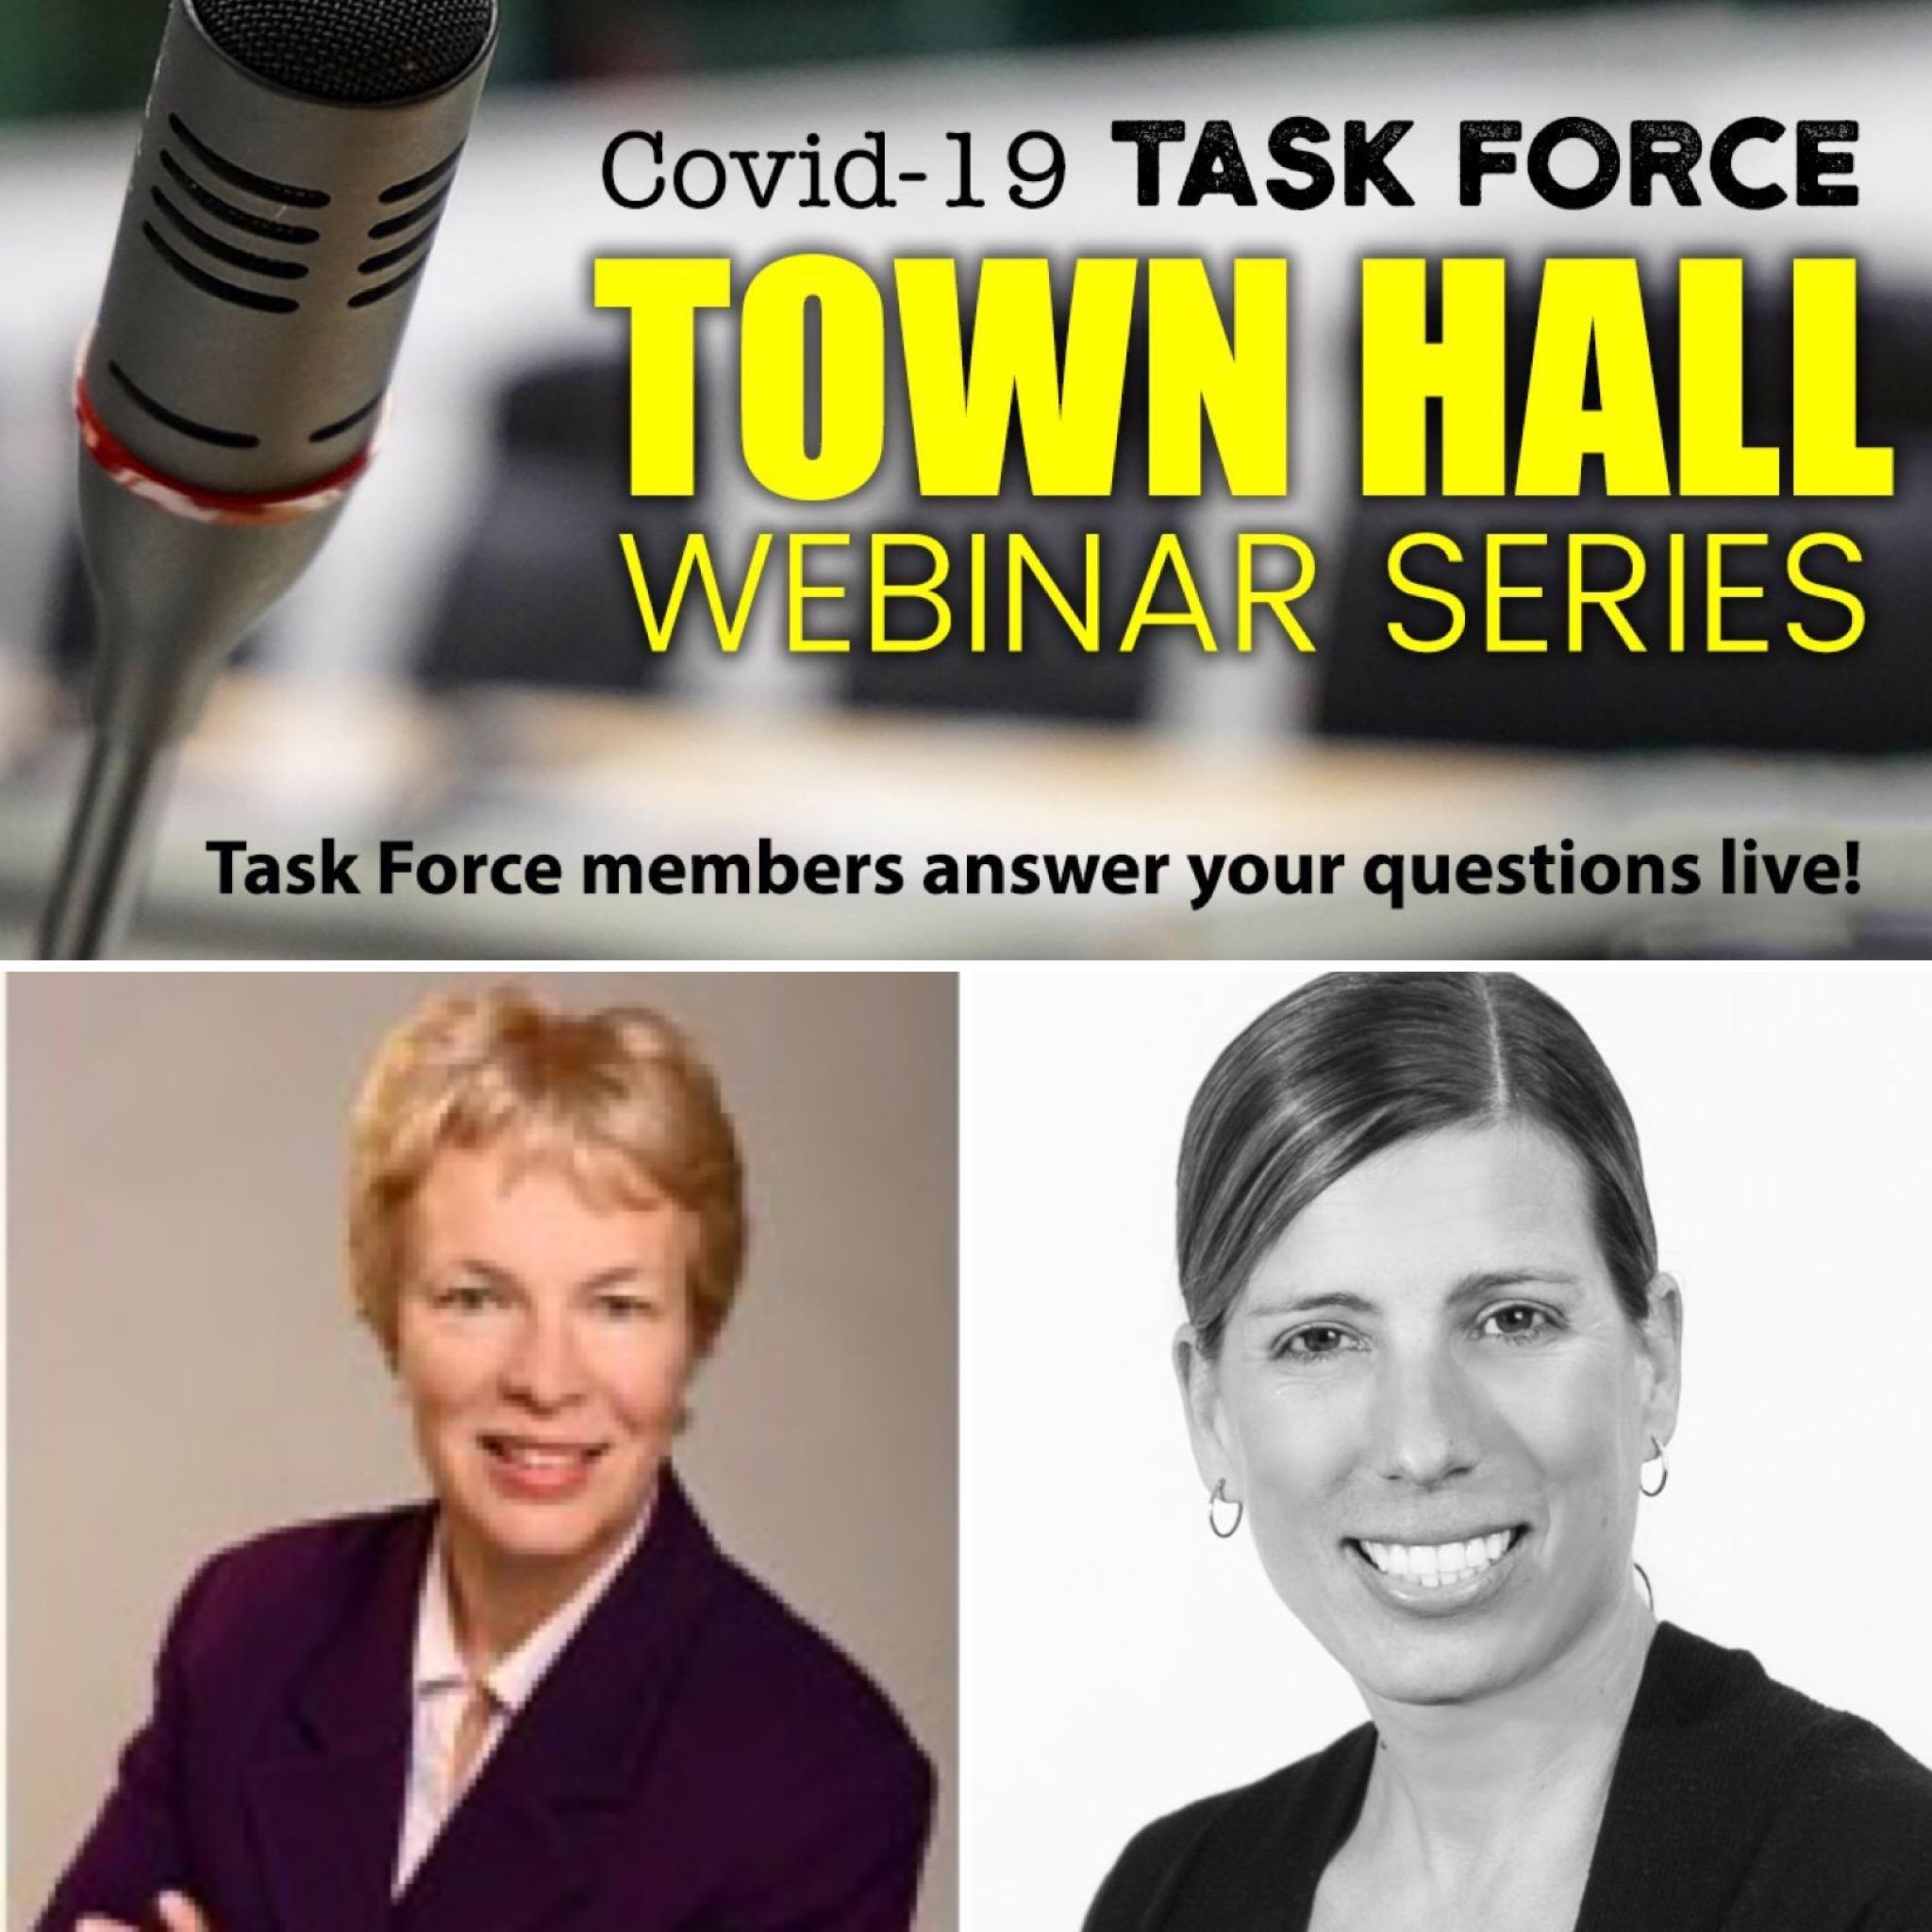 Town Hall Webinar - June 23, 2020